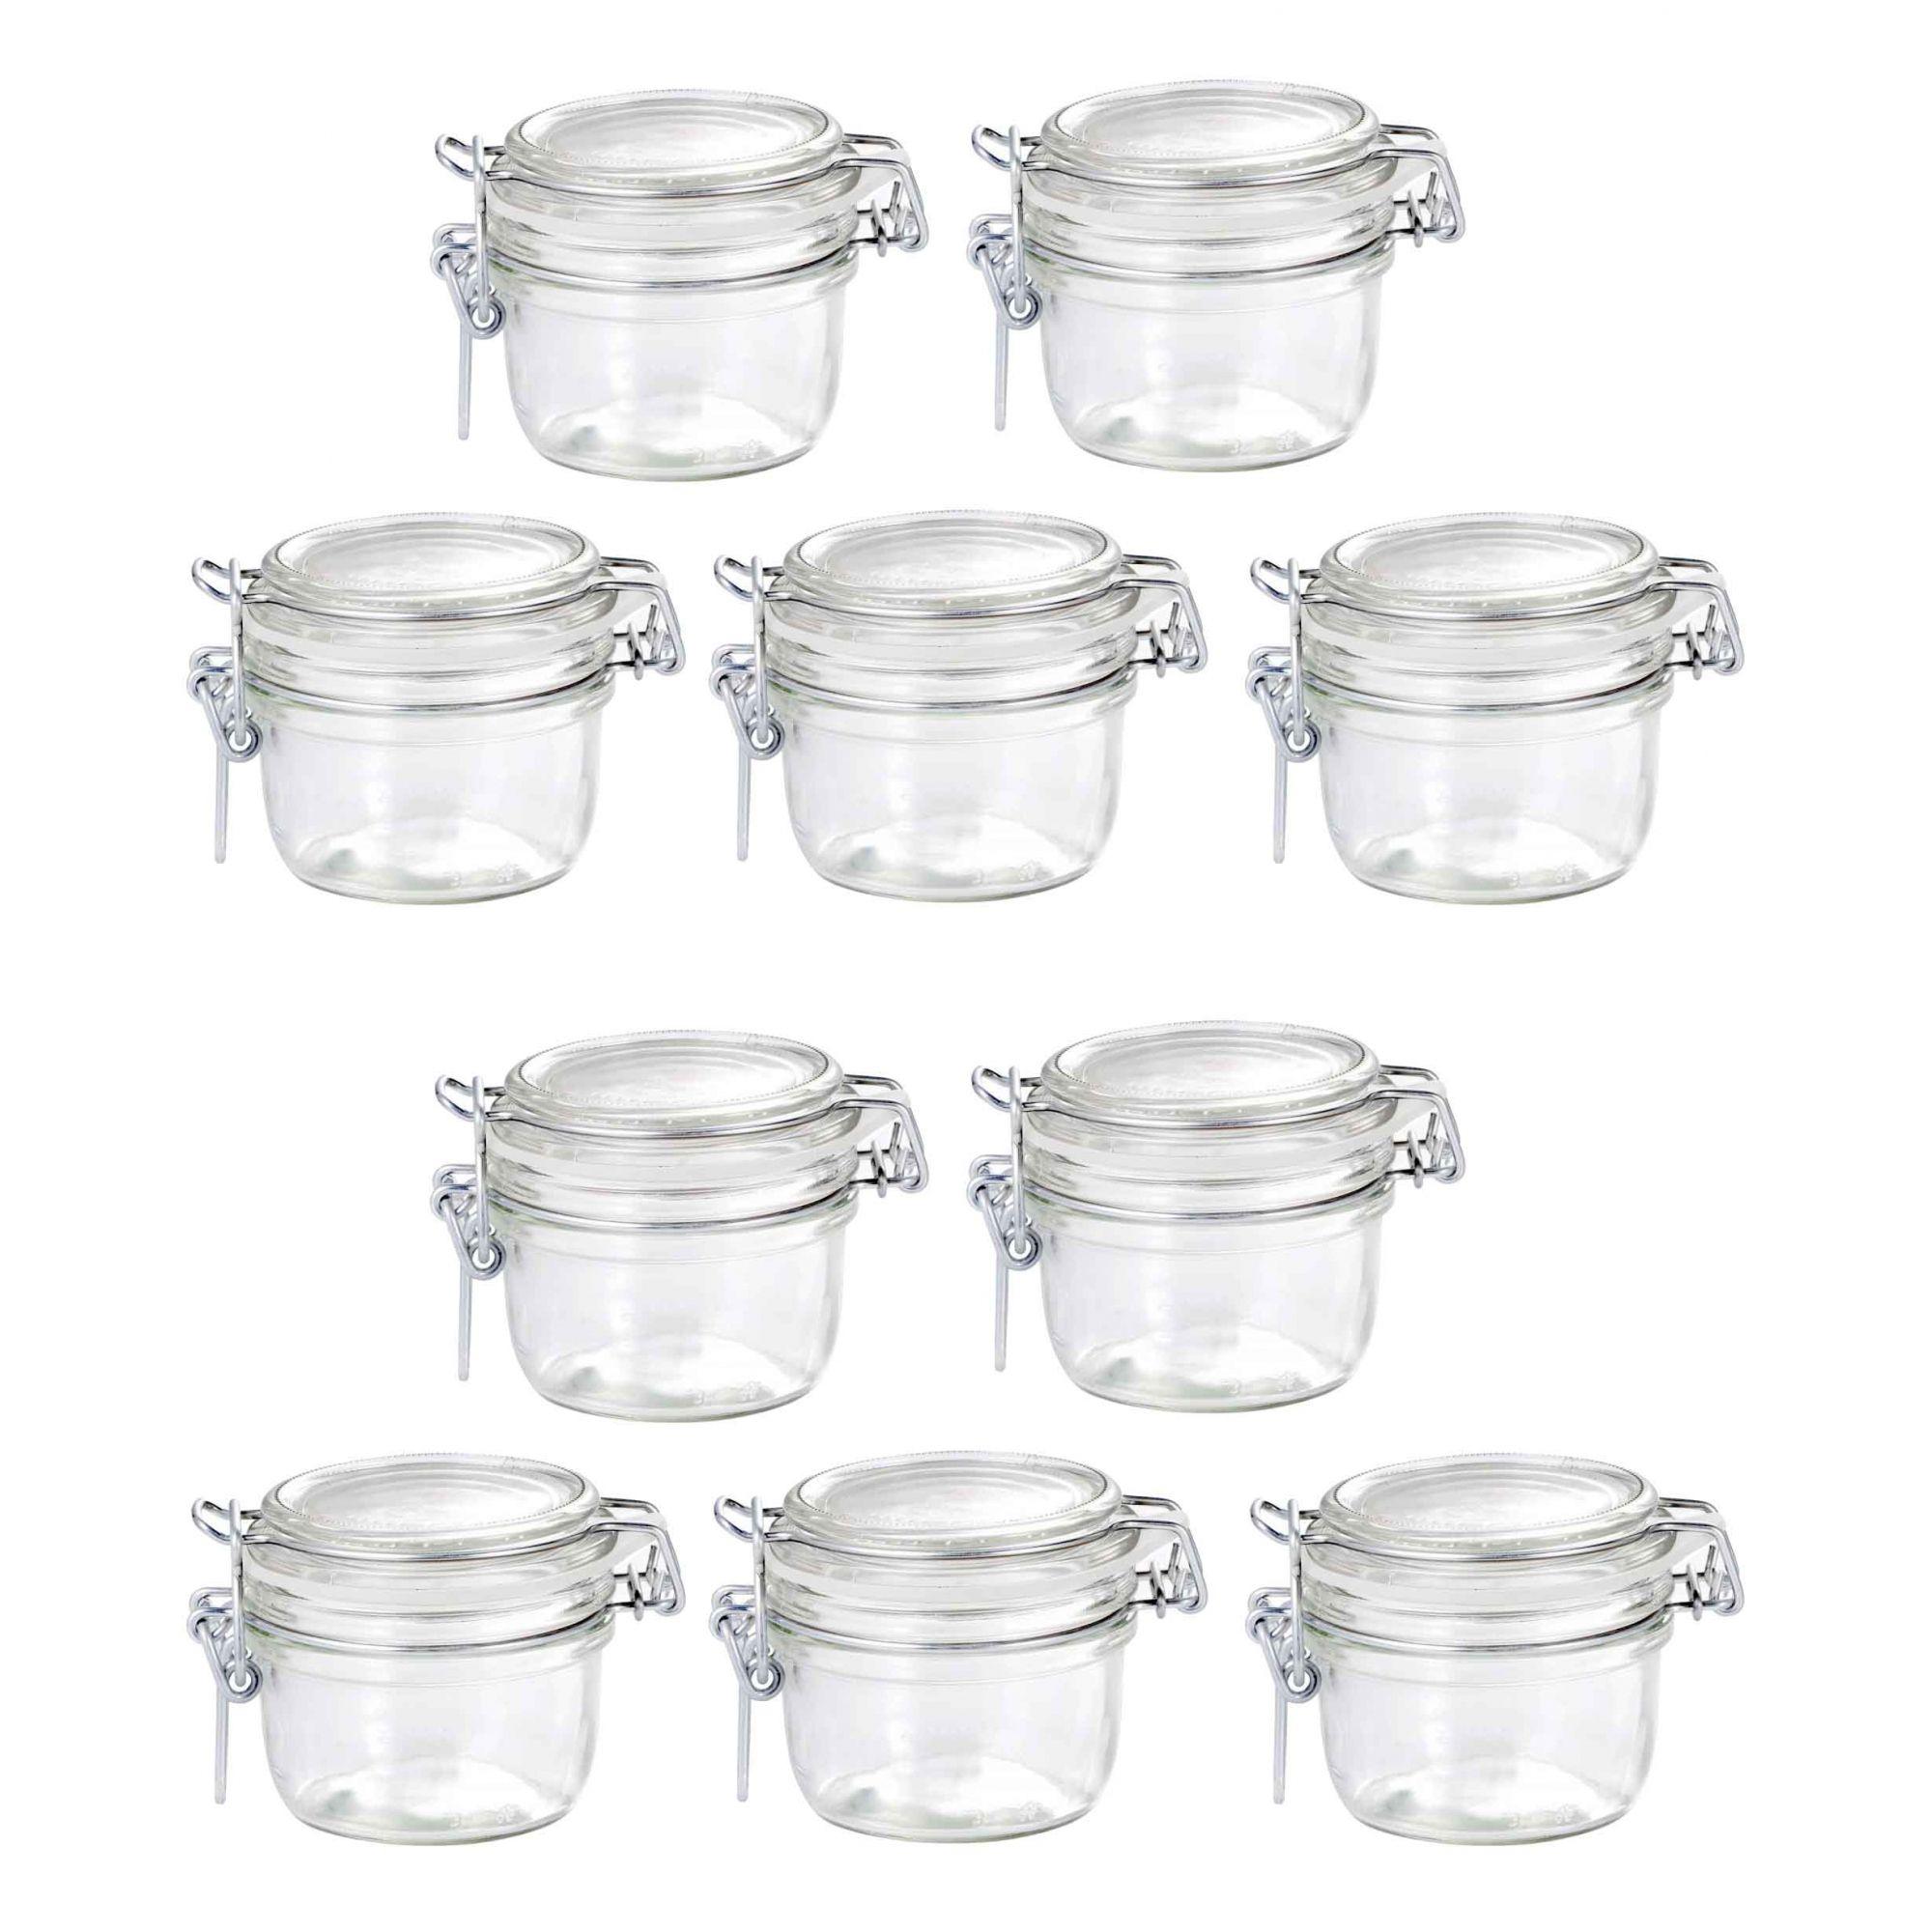 Conj 10 Pote de vidro hermético Fido Terrina 125 ml